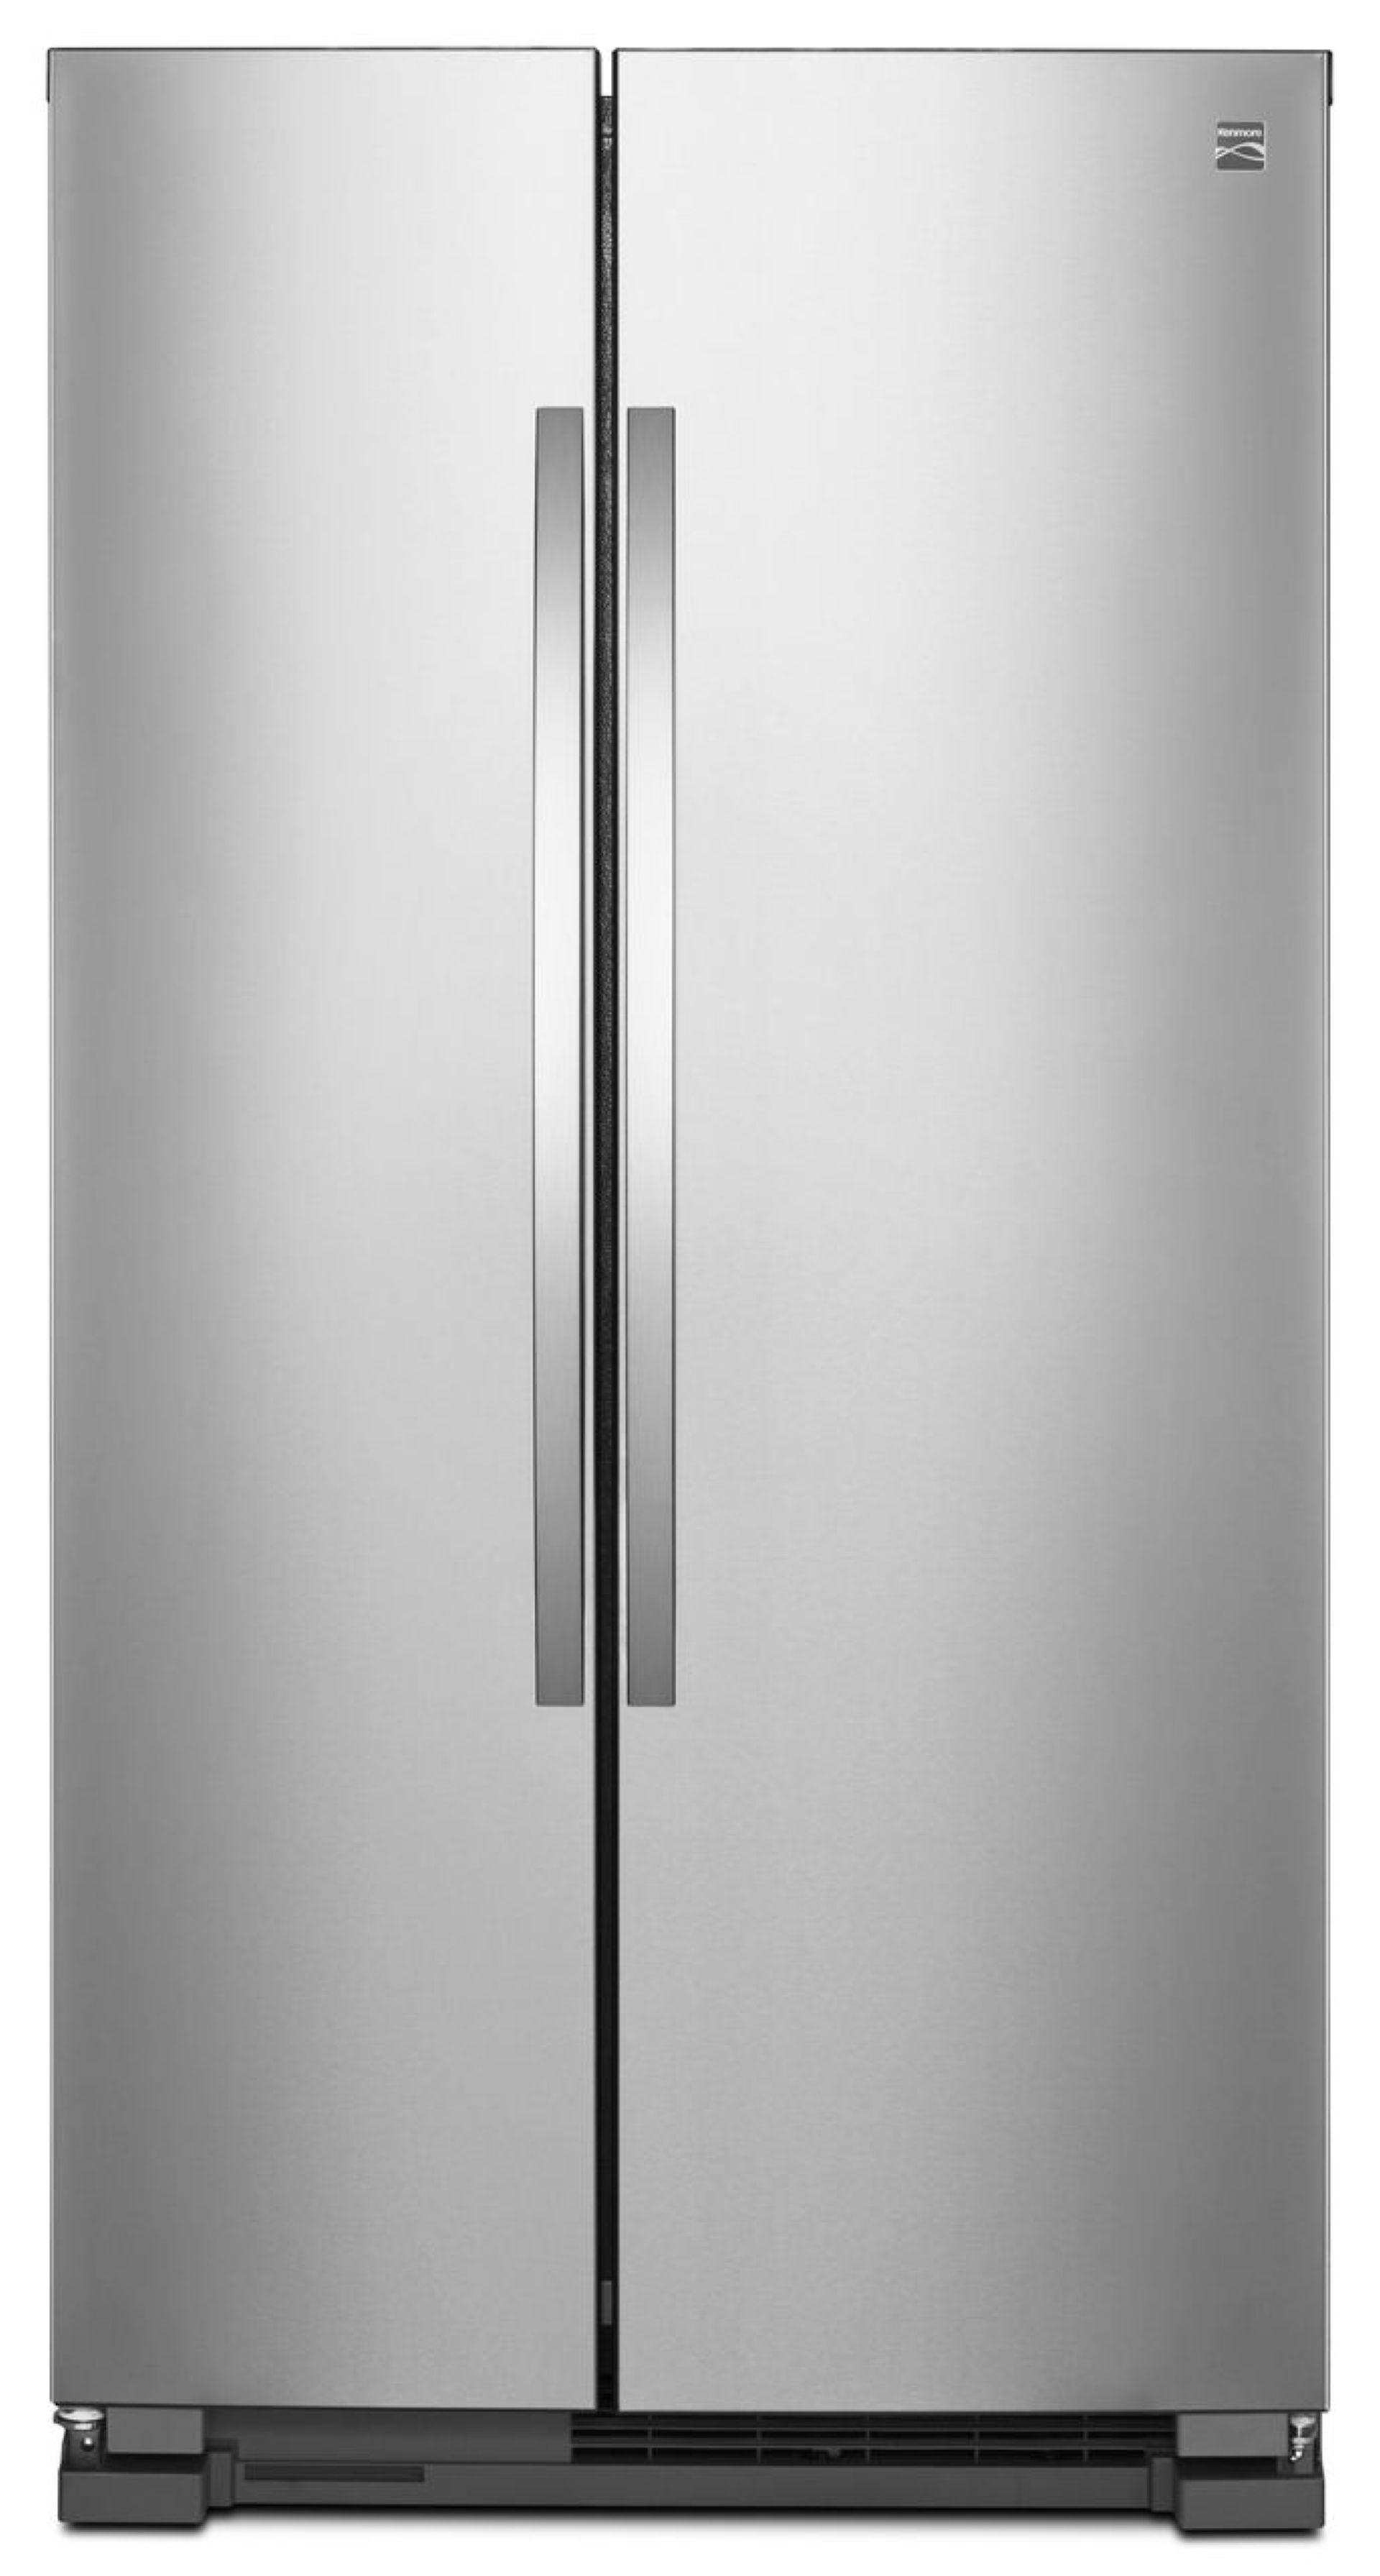 Kenmore 41173 25 cu ft SidebySide Refrigerator